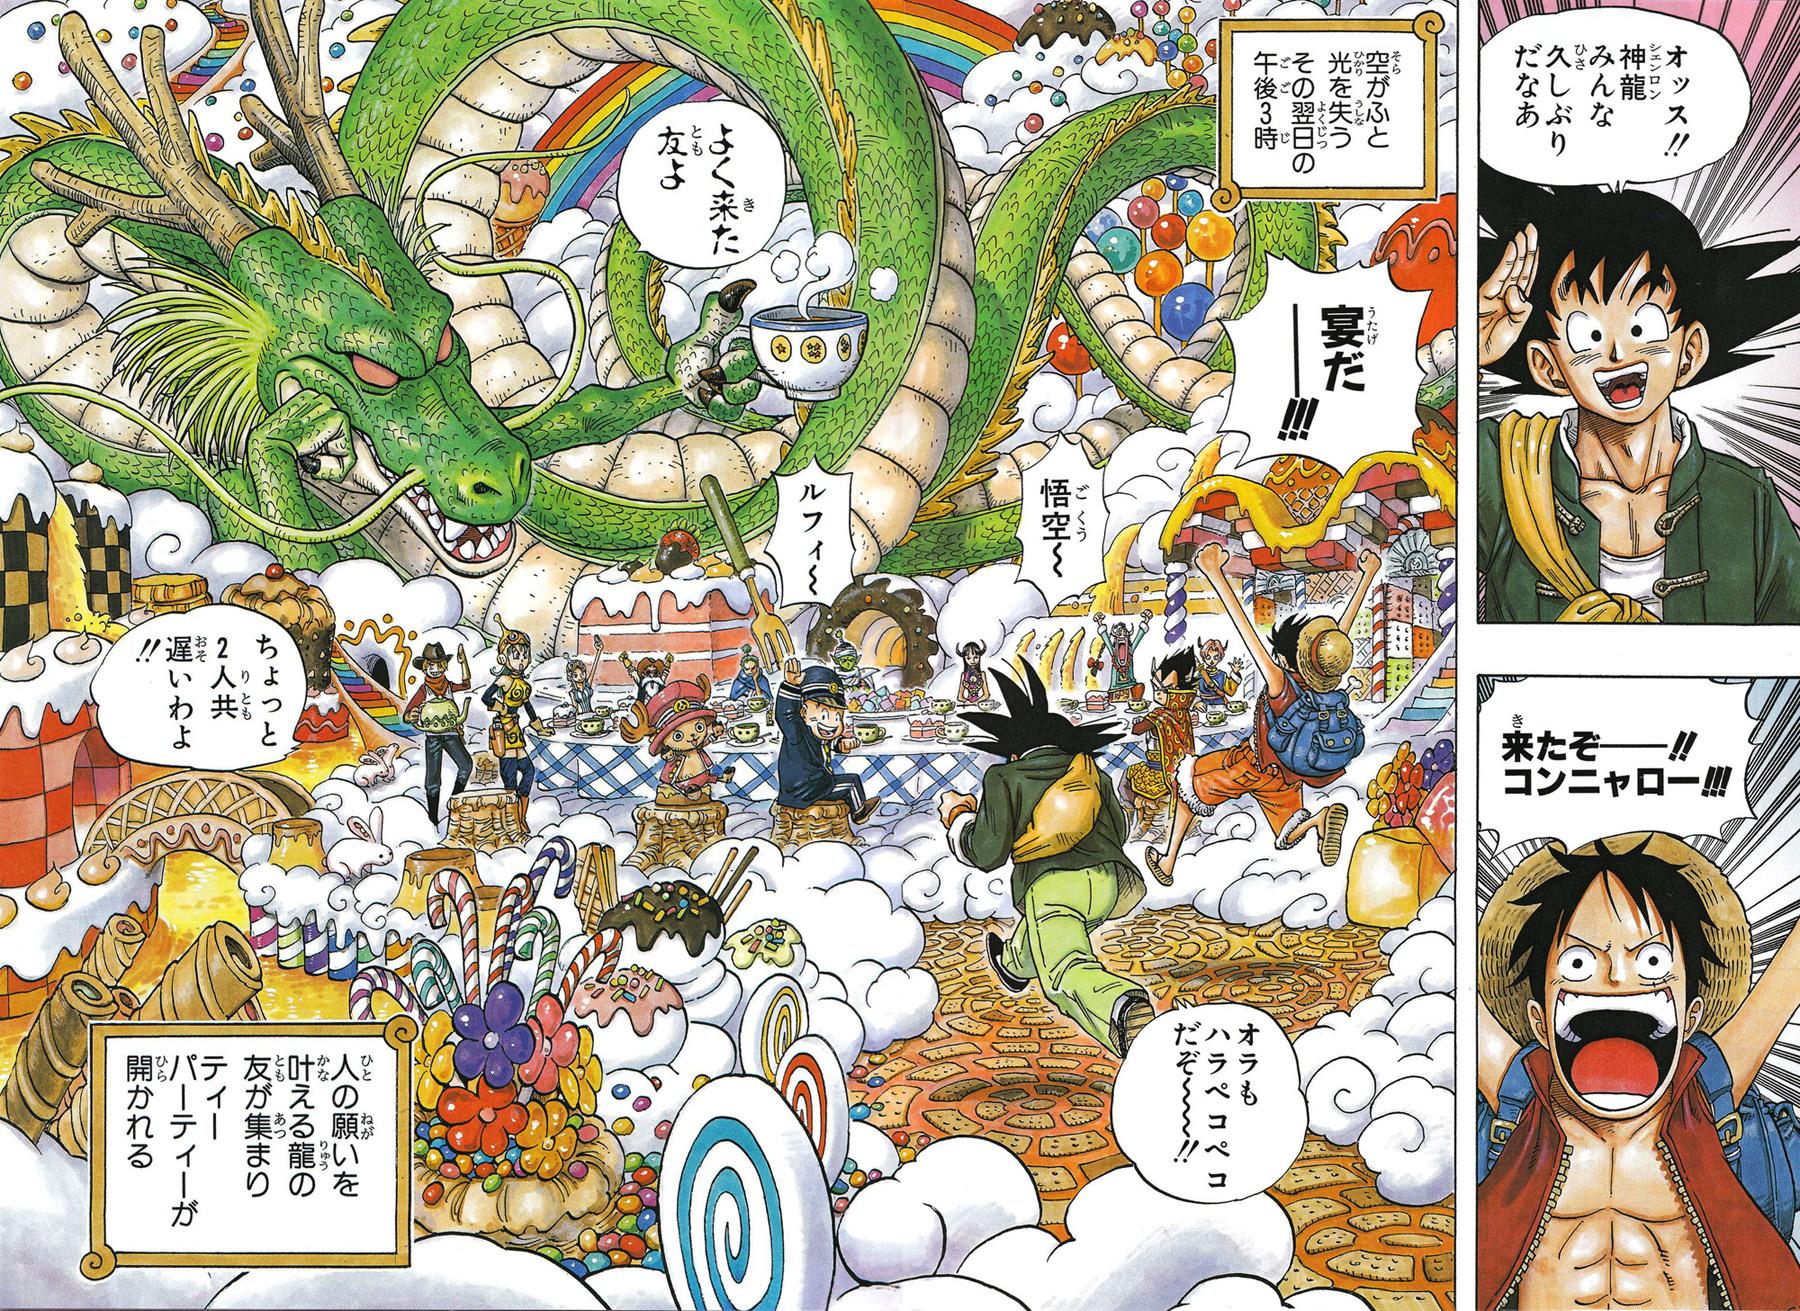 Cross Epoch - The One Piece Wiki - Manga, Anime, Pirates, Marines ...